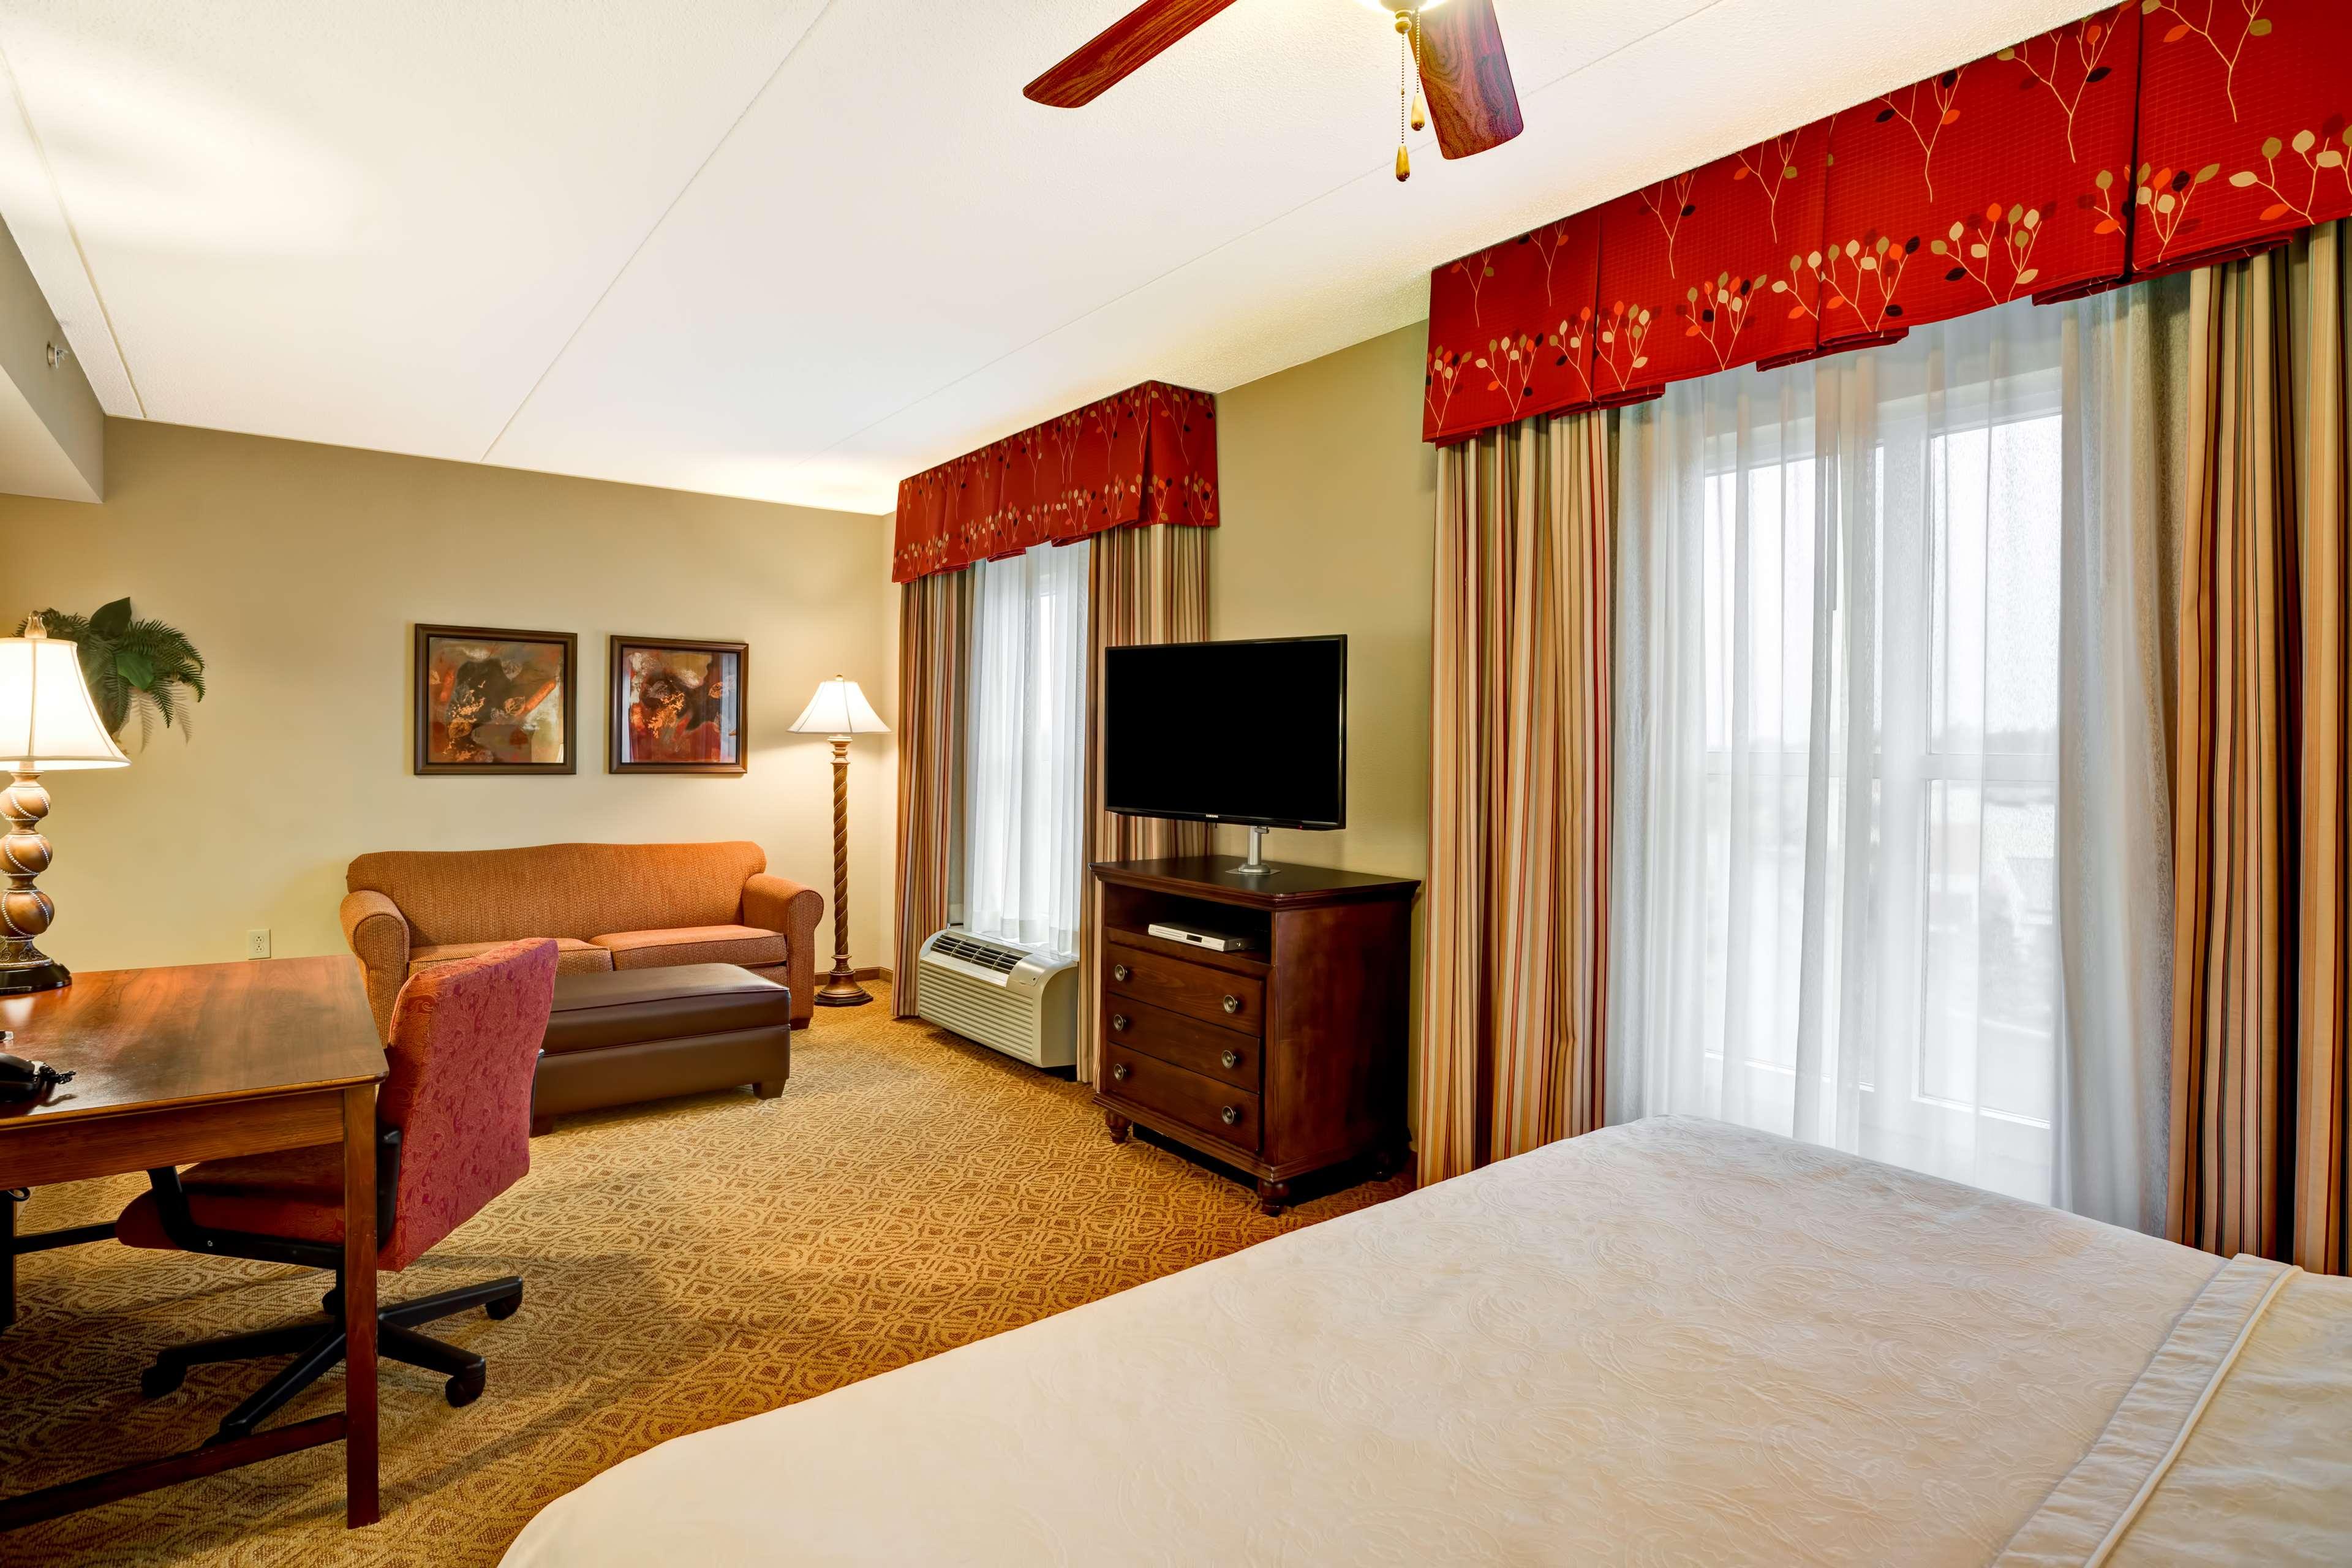 Homewood Suites by Hilton Fredericksburg image 33